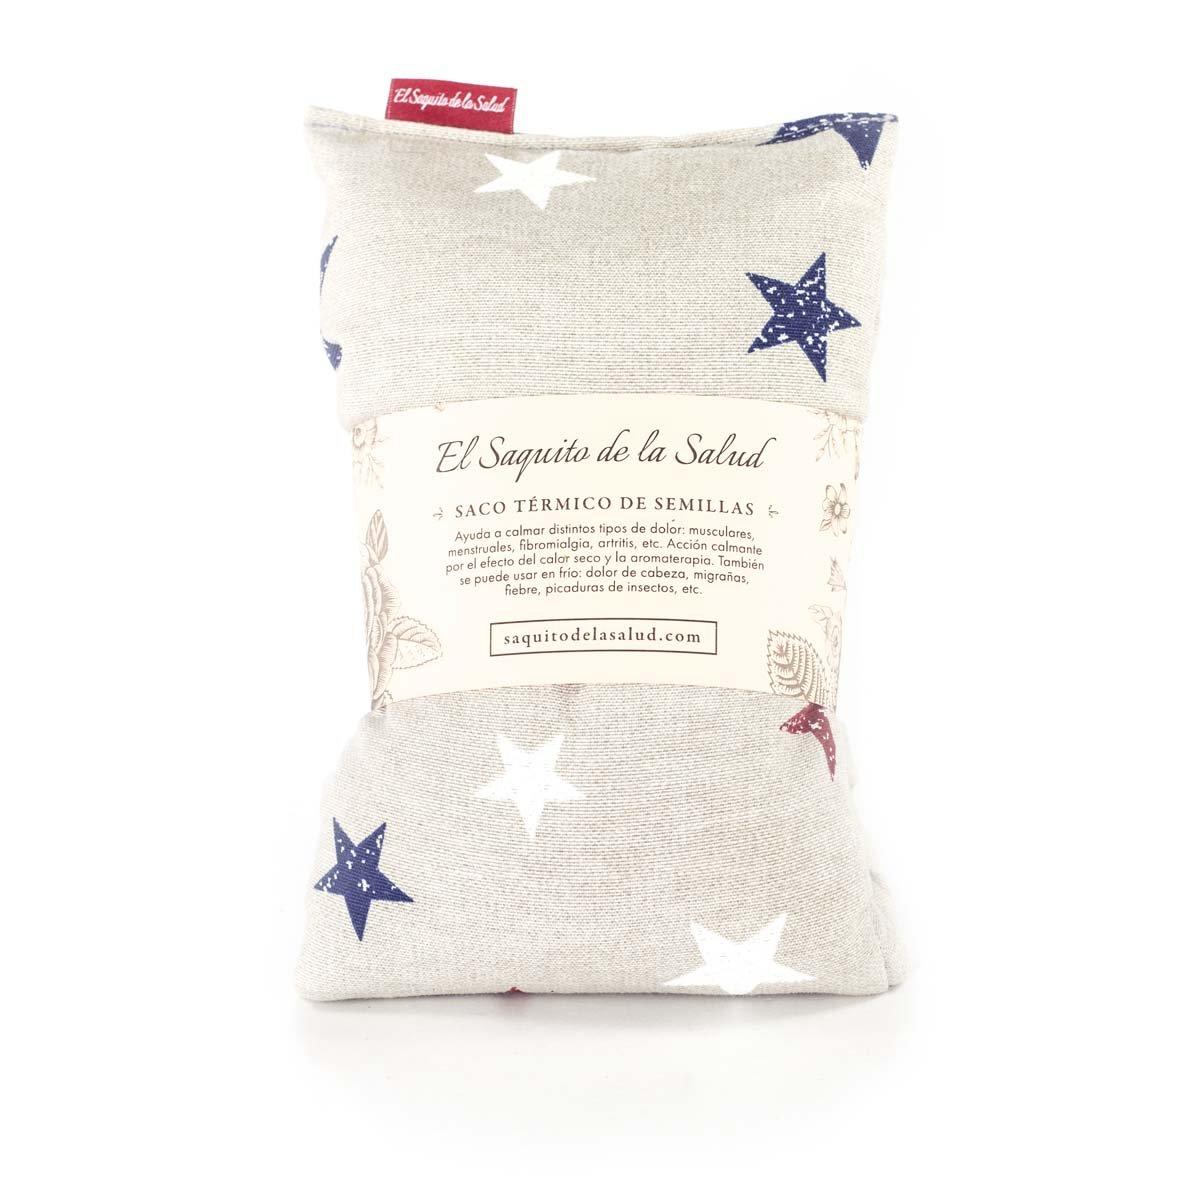 Saco Térmico de Semillas aroma Lavanda, Azahar o Romero tejido Gris con Estrellas (Azahar, 50 cm): Amazon.es: Hogar